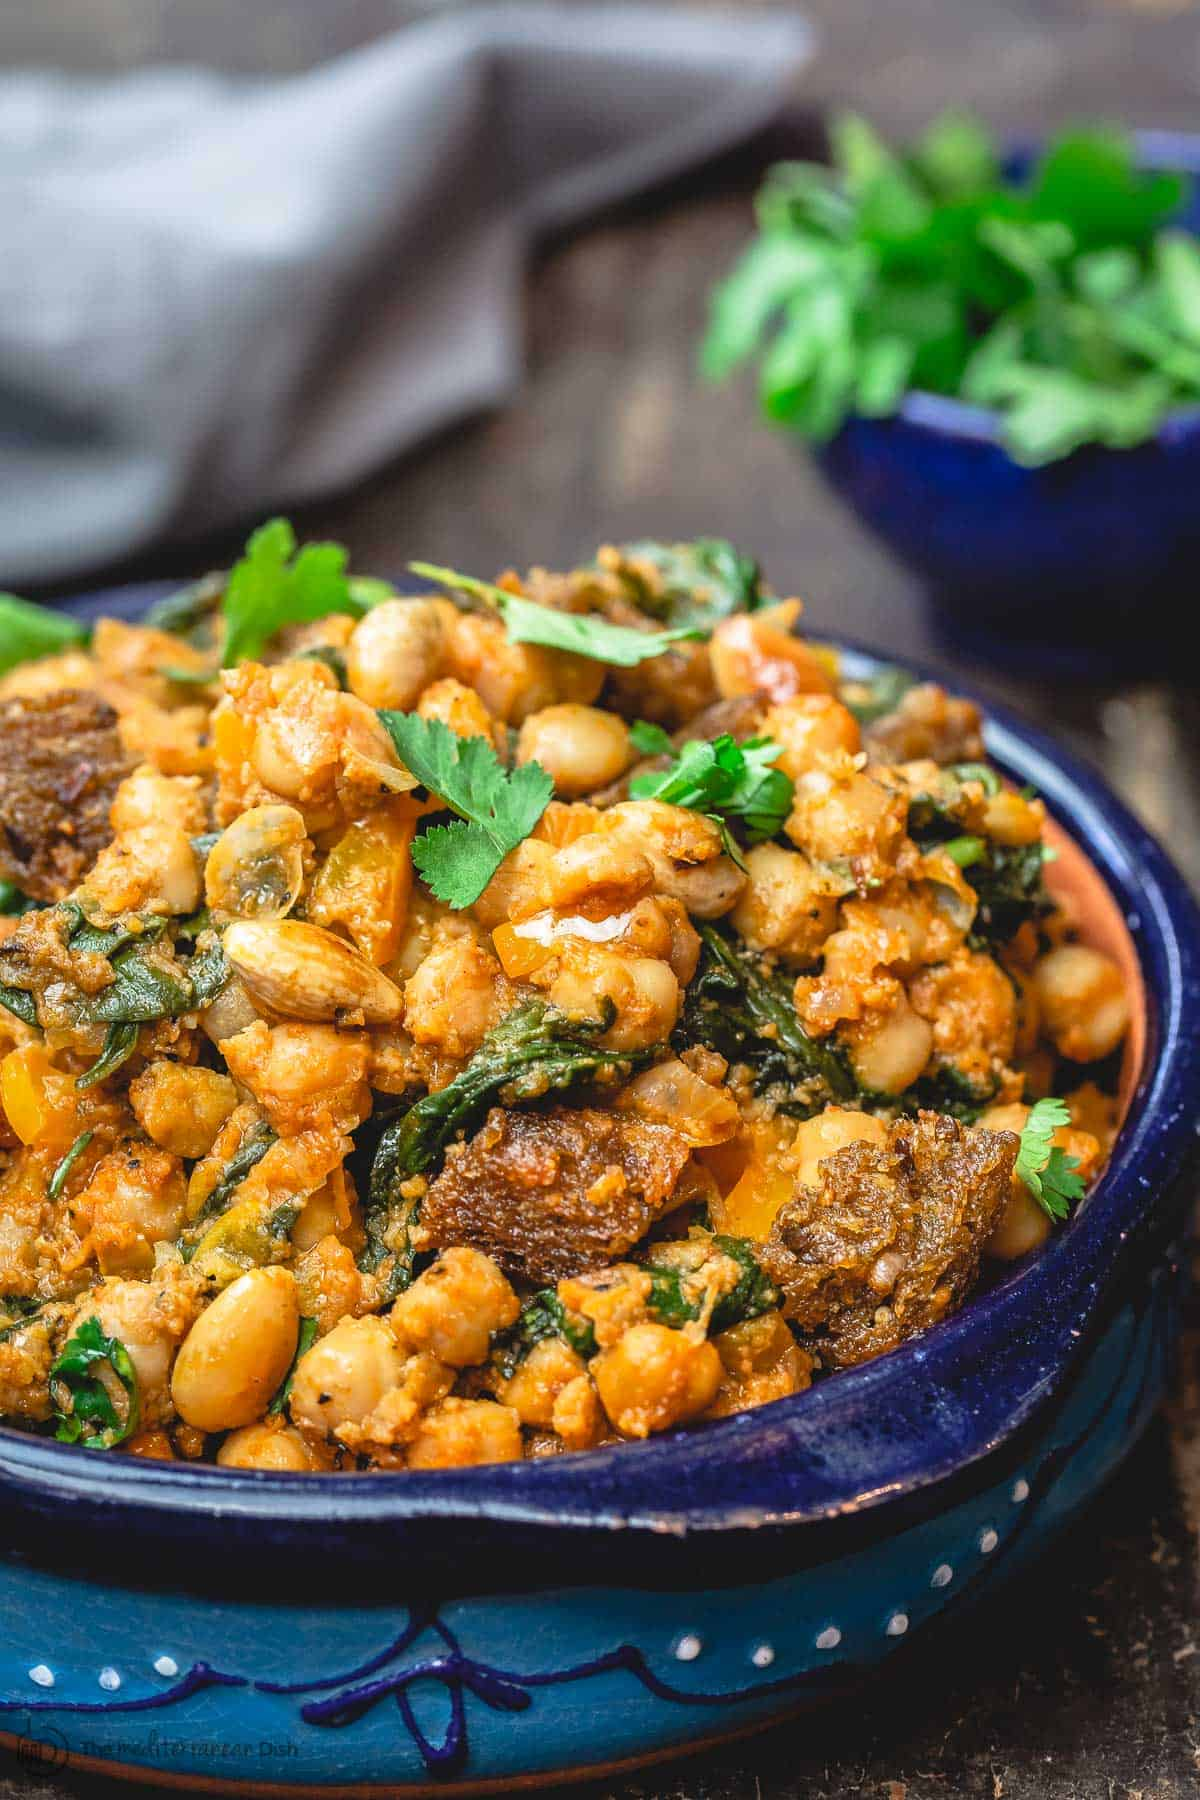 Recipe for Spanish Chickpea Stew